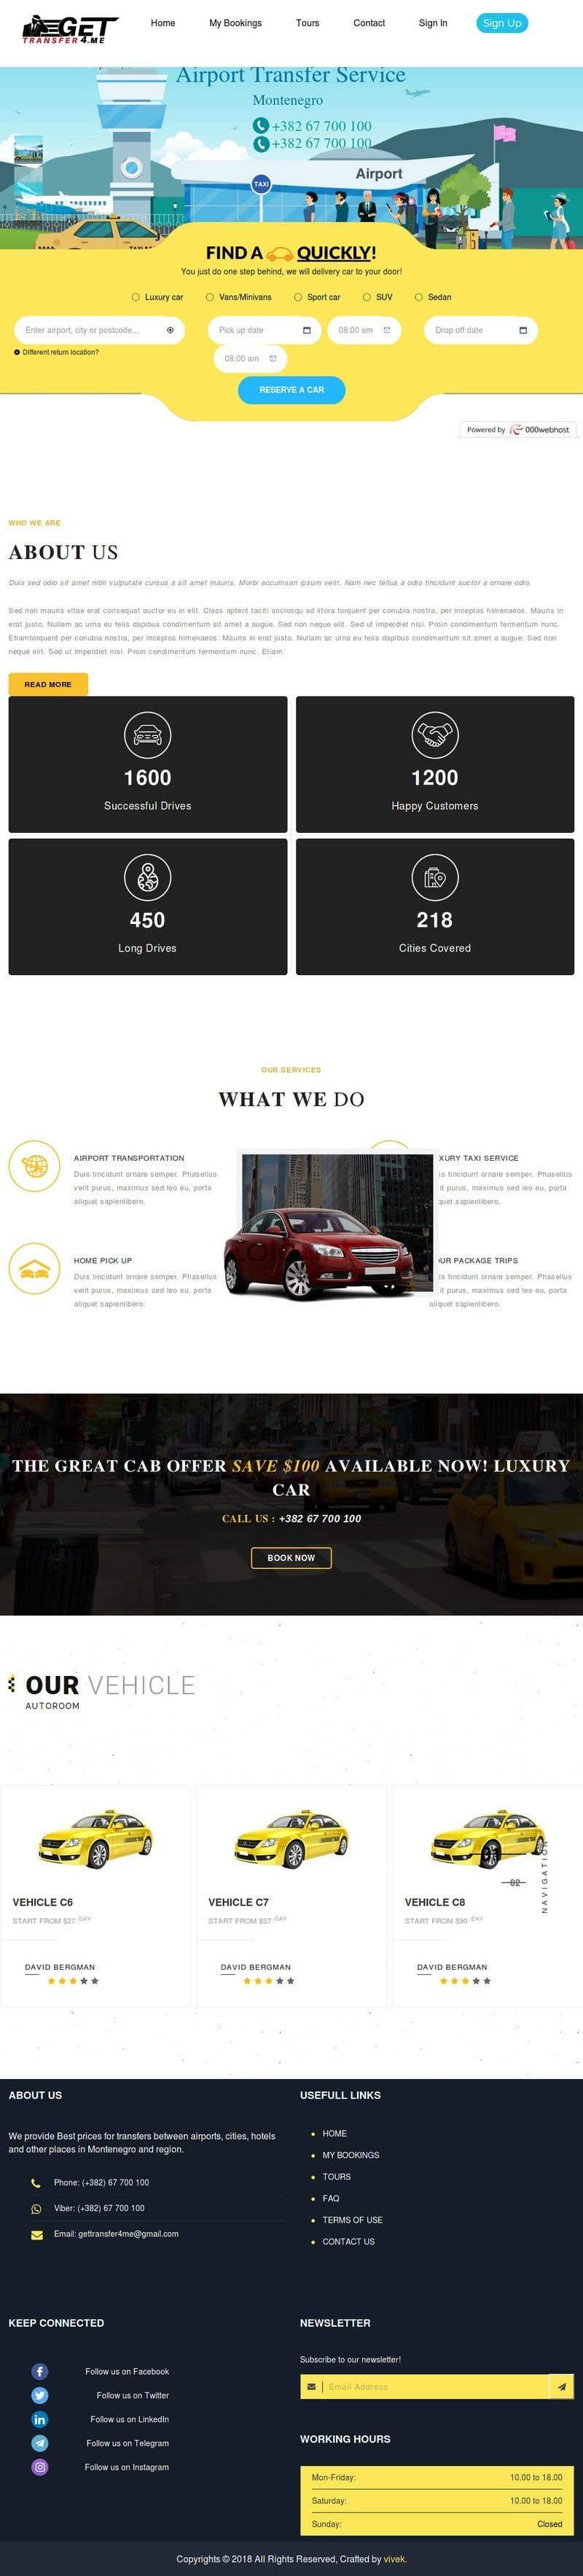 Kilpailutyö #30 kilpailussa Existing website - redesign